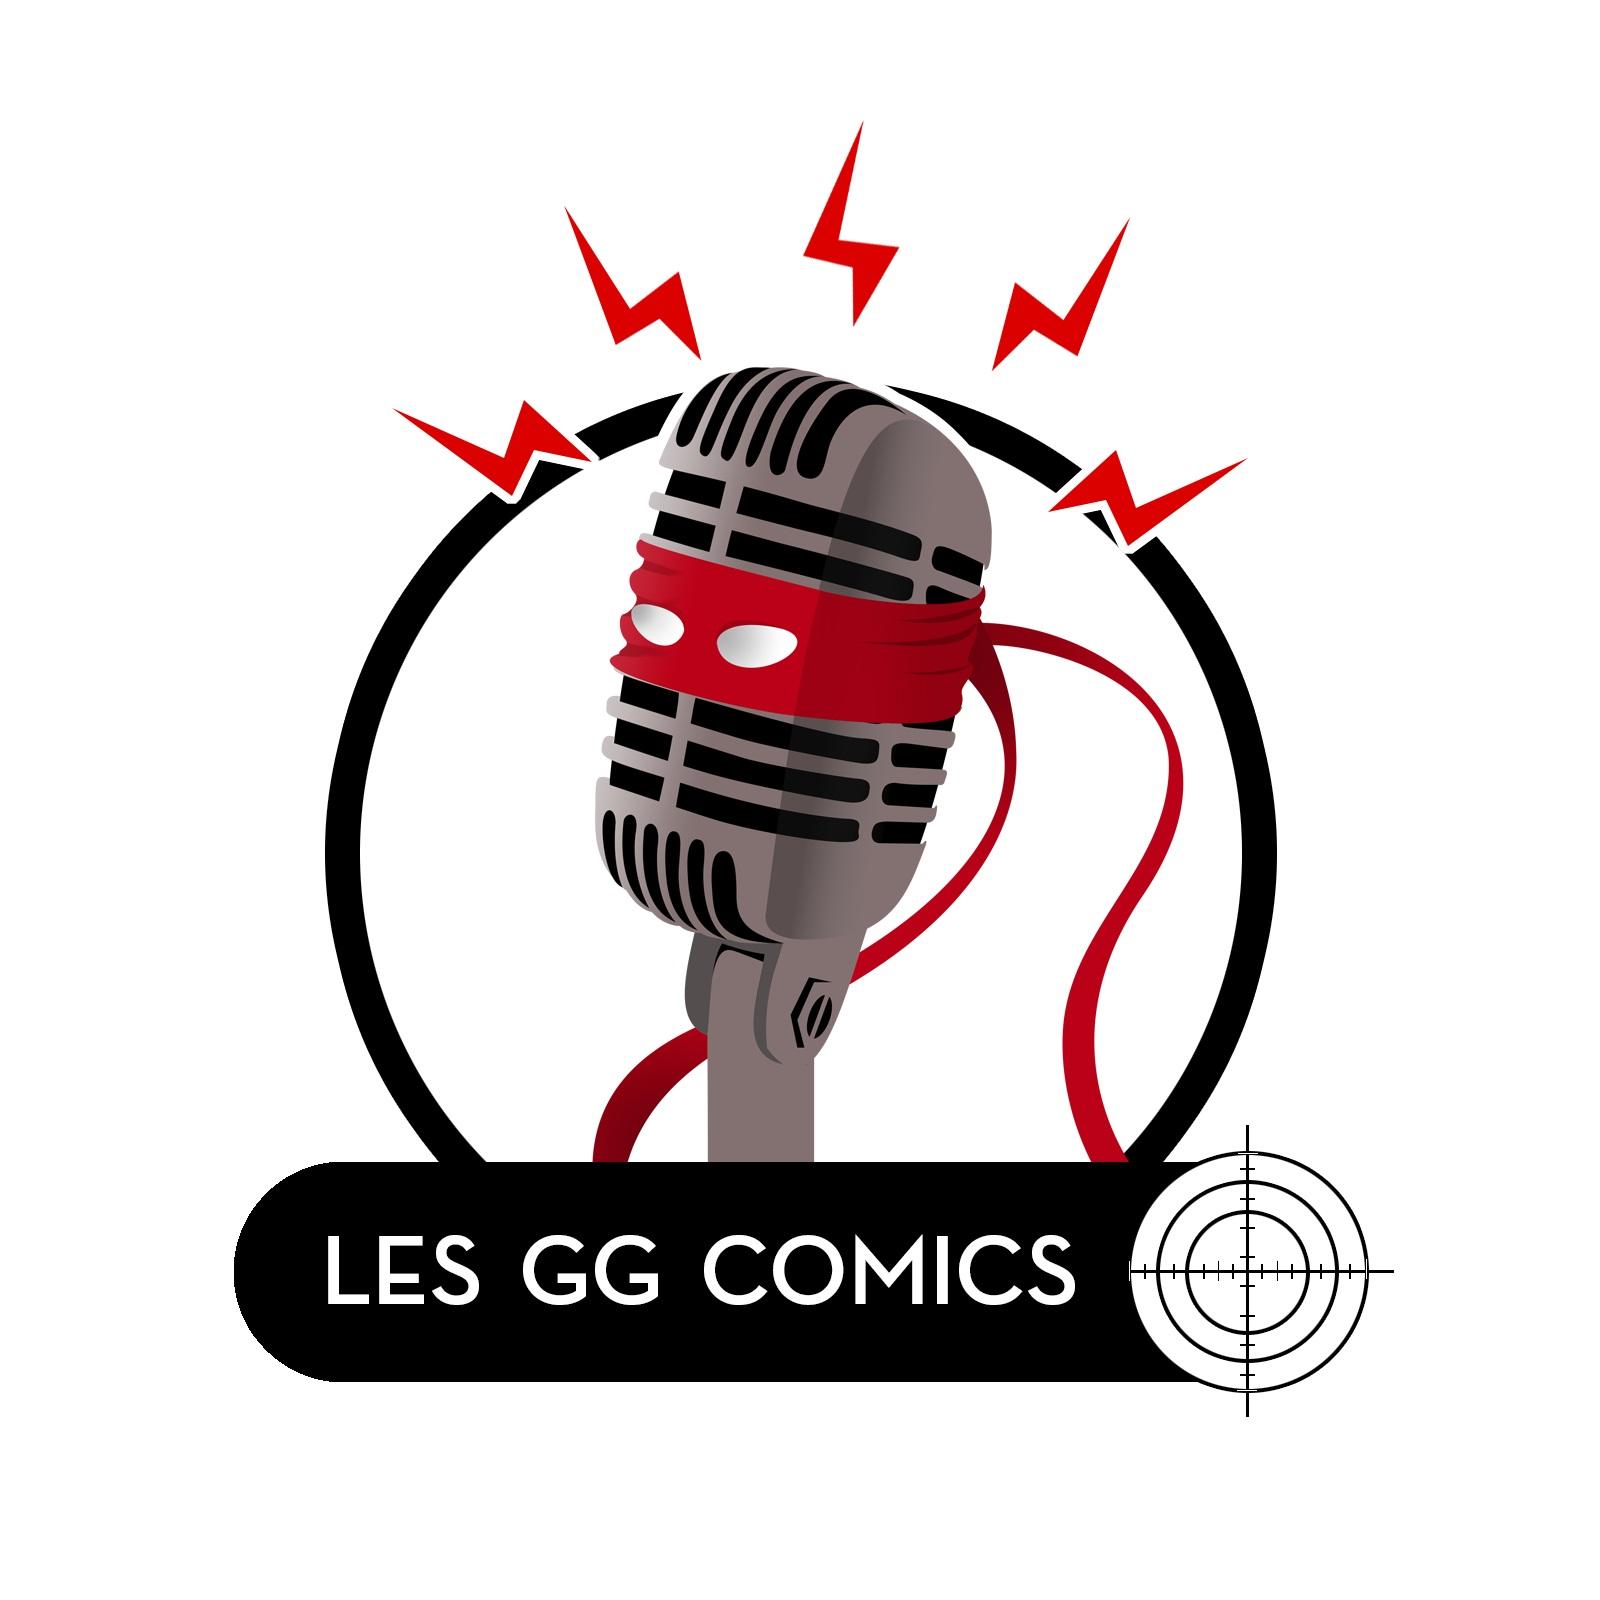 Les GG Comics #63 : Les comics doivent-ils batifoler avec les mangas et la franco belge ?